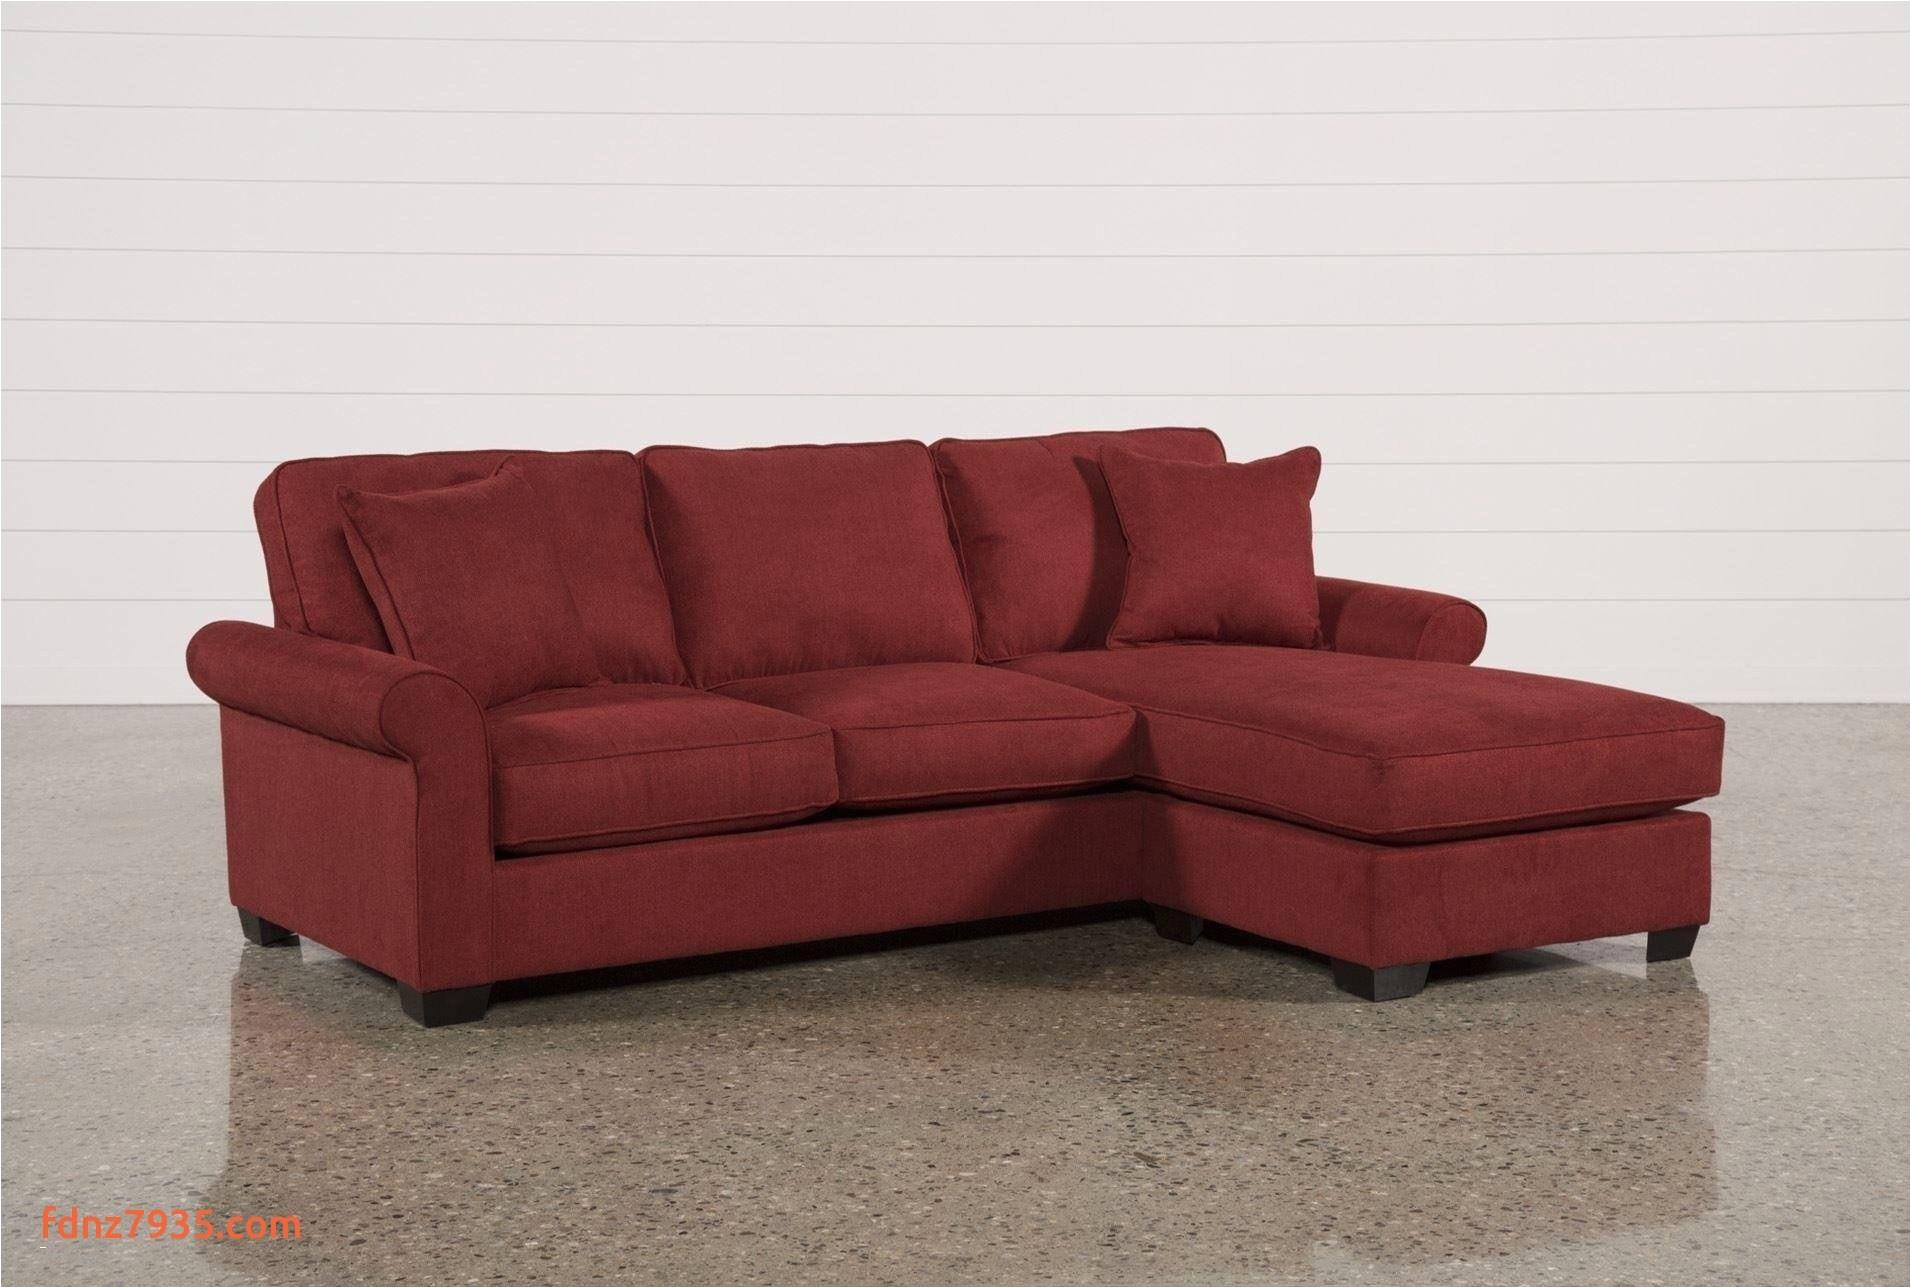 chaise sofa sleeper unique furniture best leather loveseats leather loveseats 0d furnitures